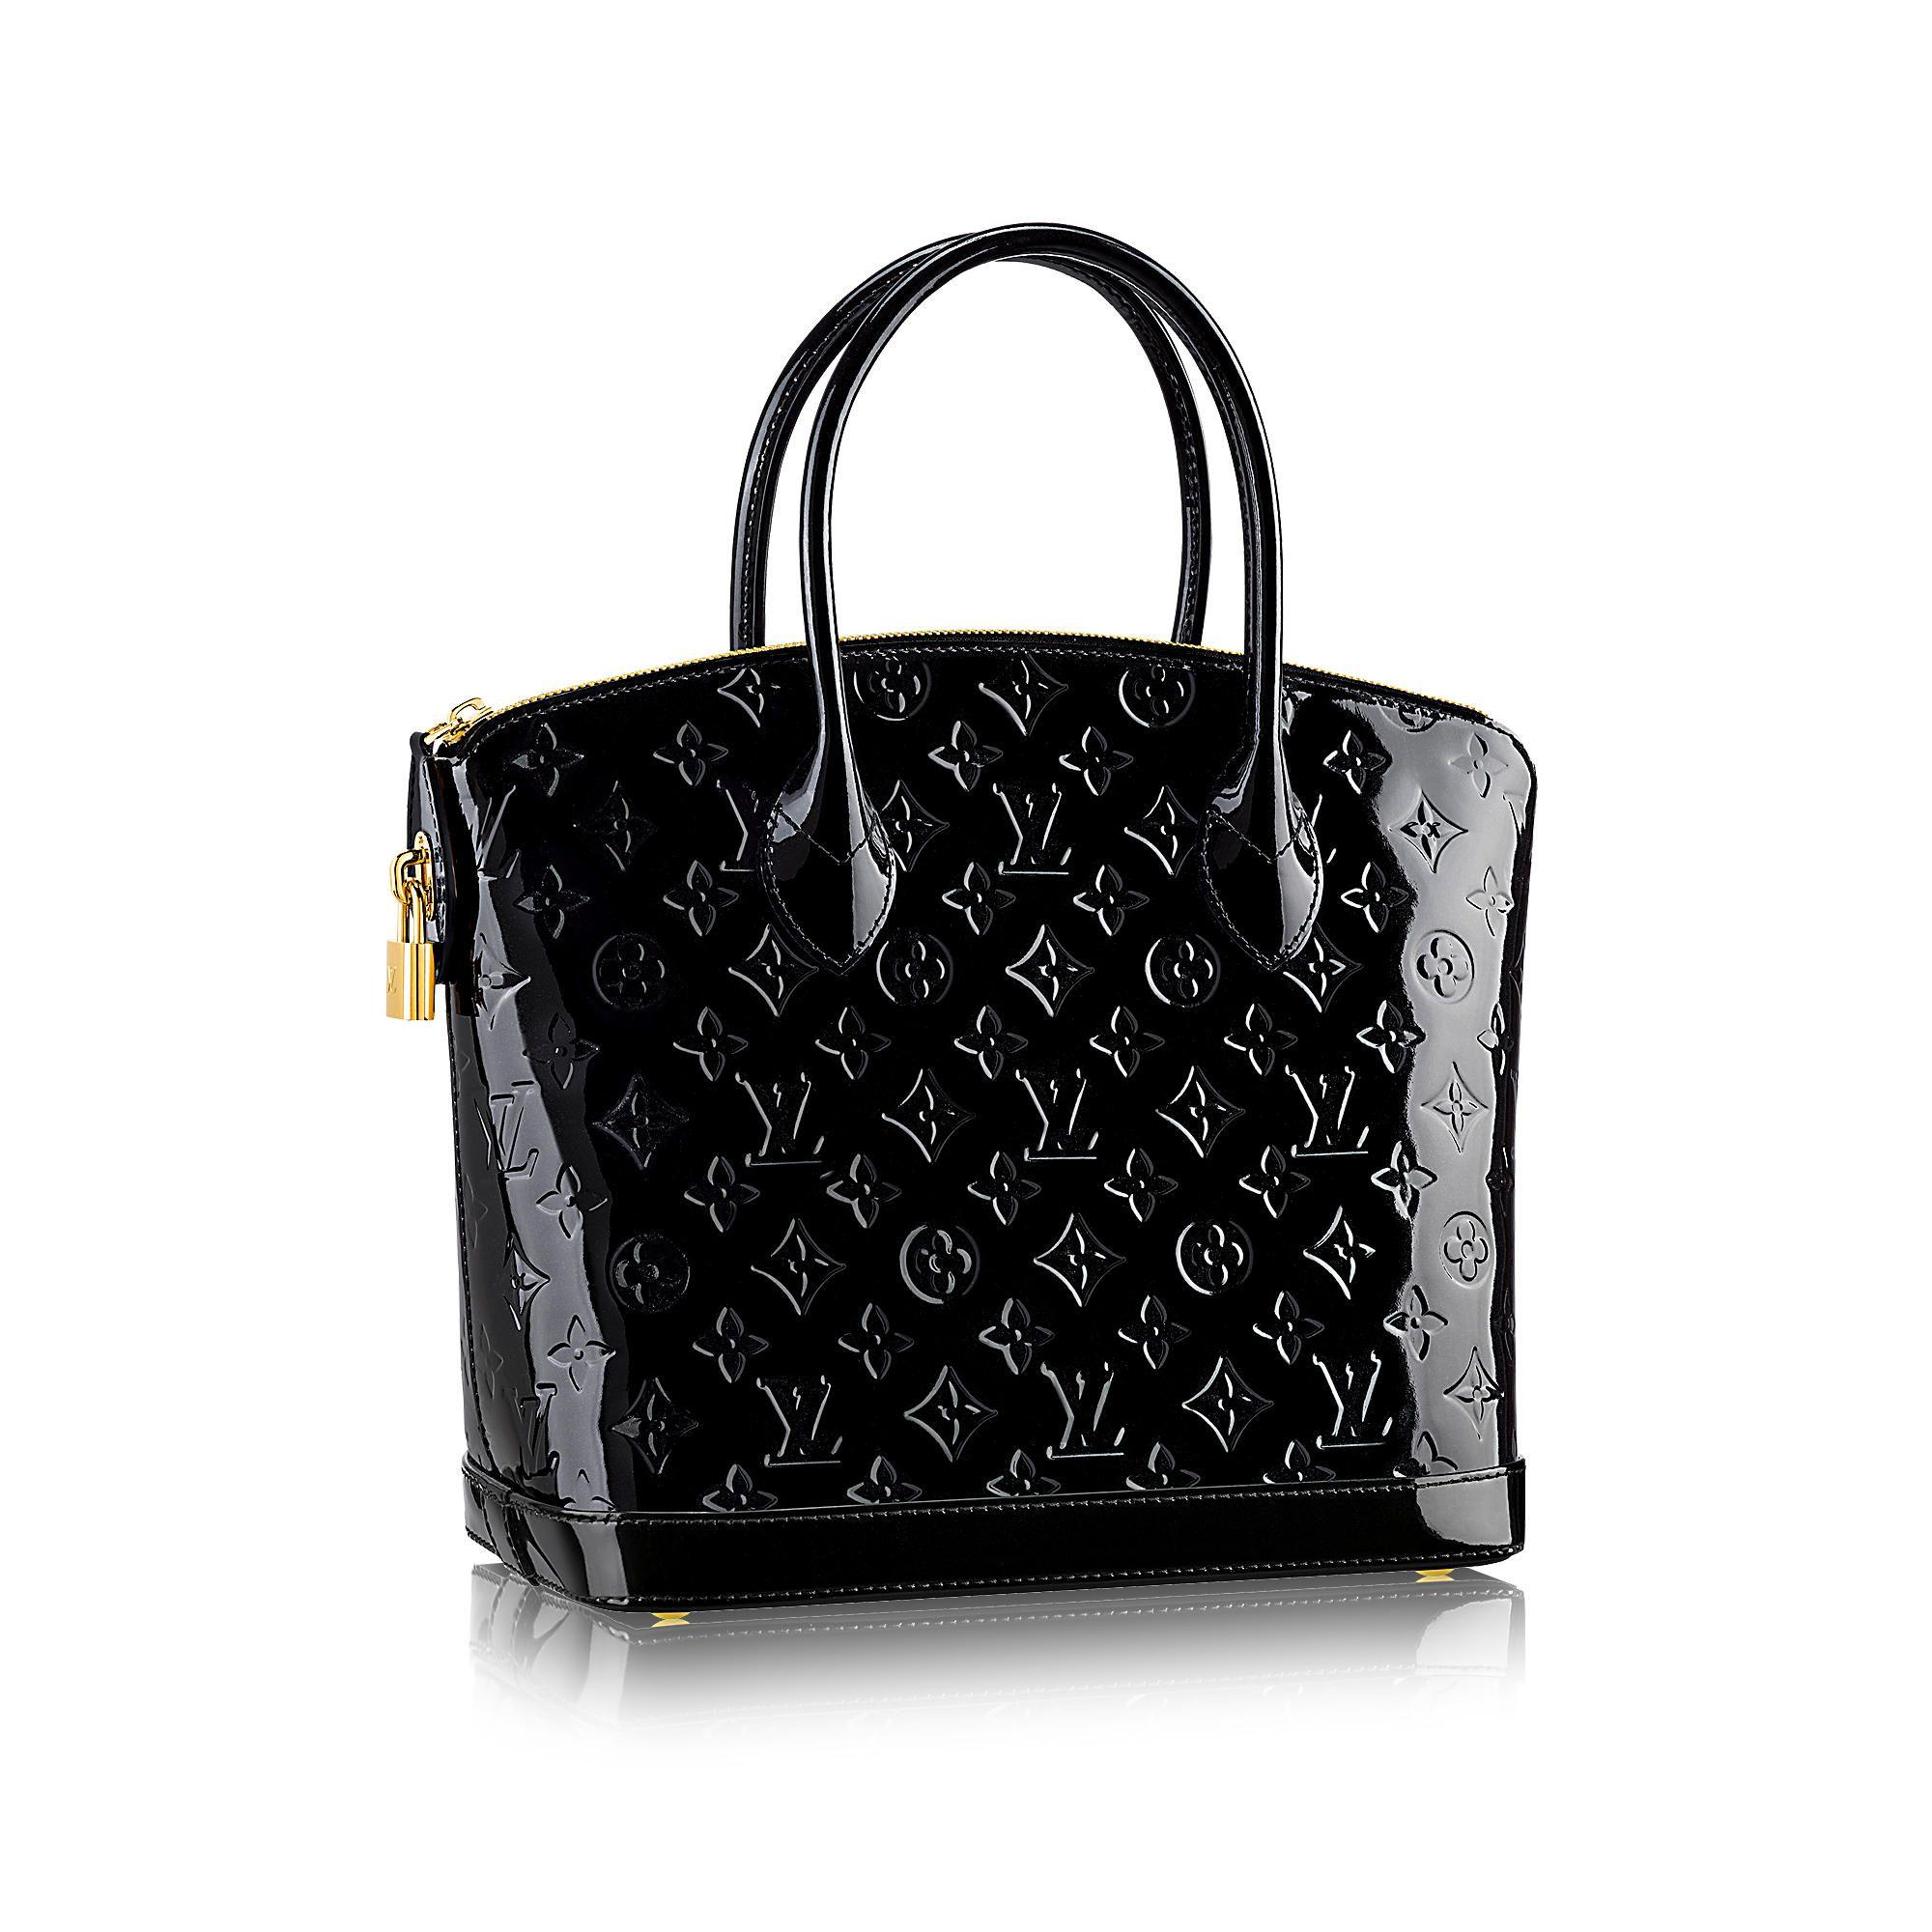 Buy Authentic Louis Vuitton Handbags : Handbags - Louis Vuitton Women Louis  Vuitton Men Louis Vuitton Styles Buy Authentic Louis Vuitton Handbags from  ...